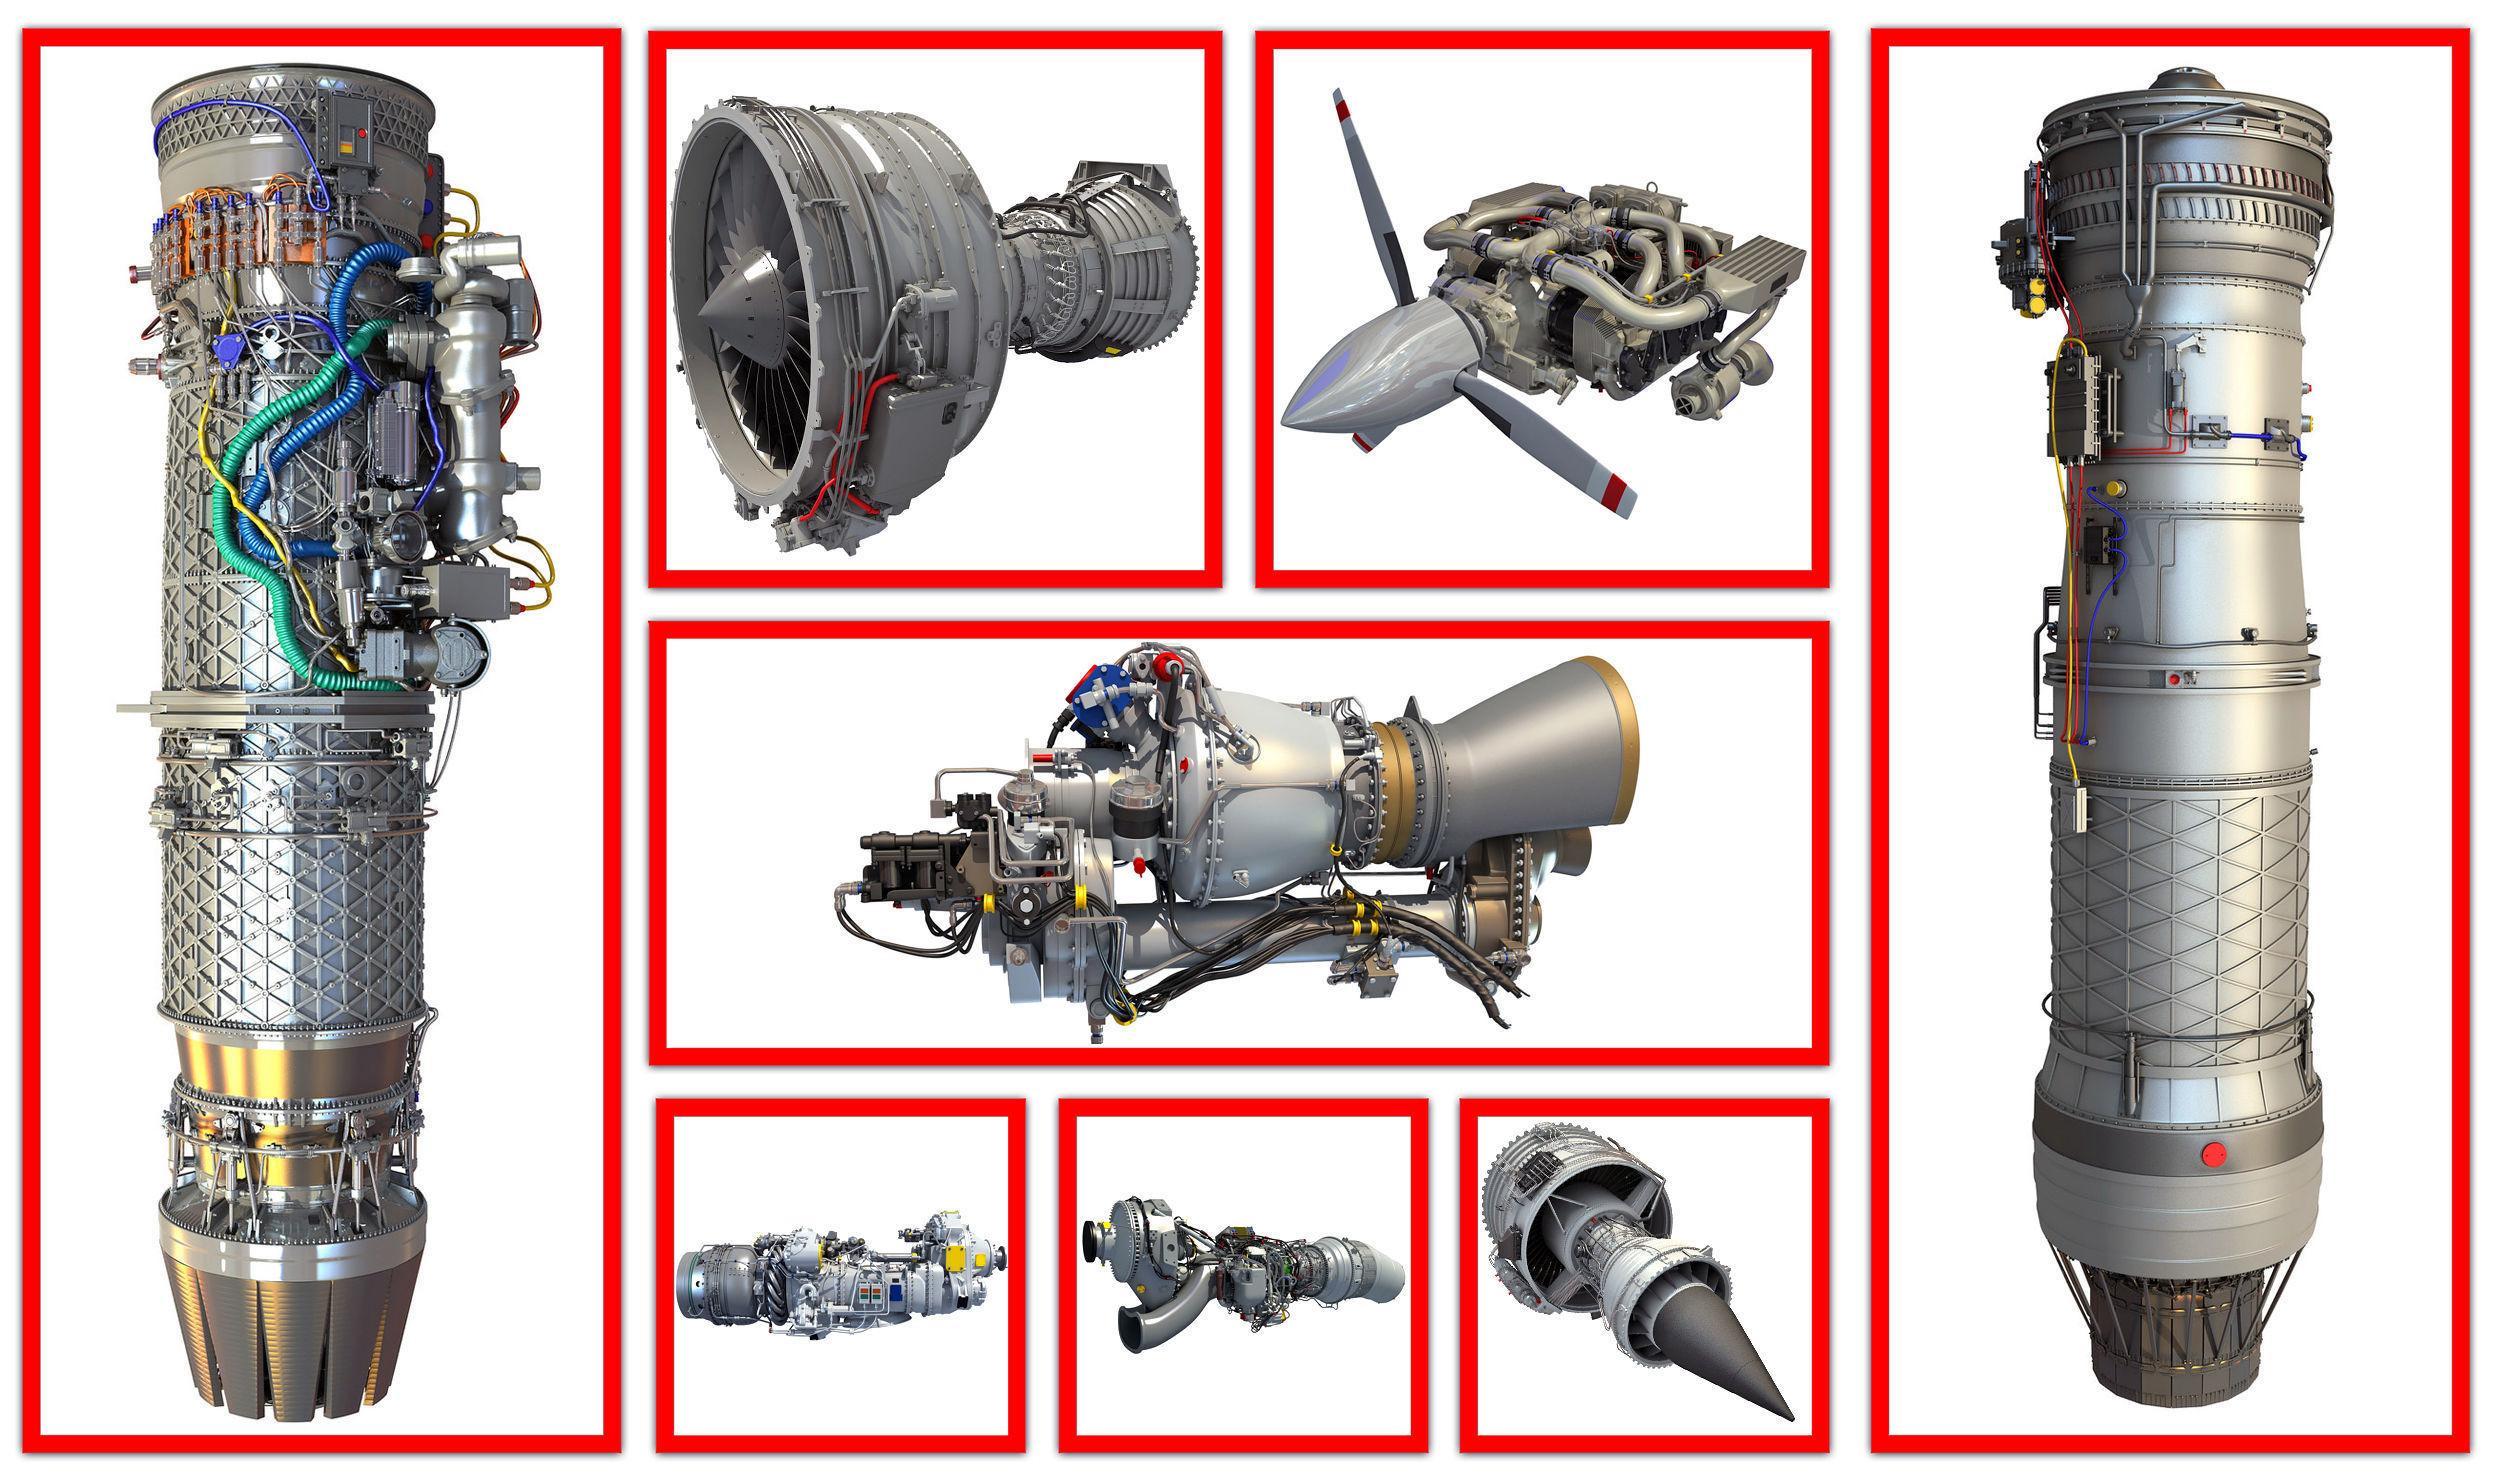 8 Aircraft Engine Models